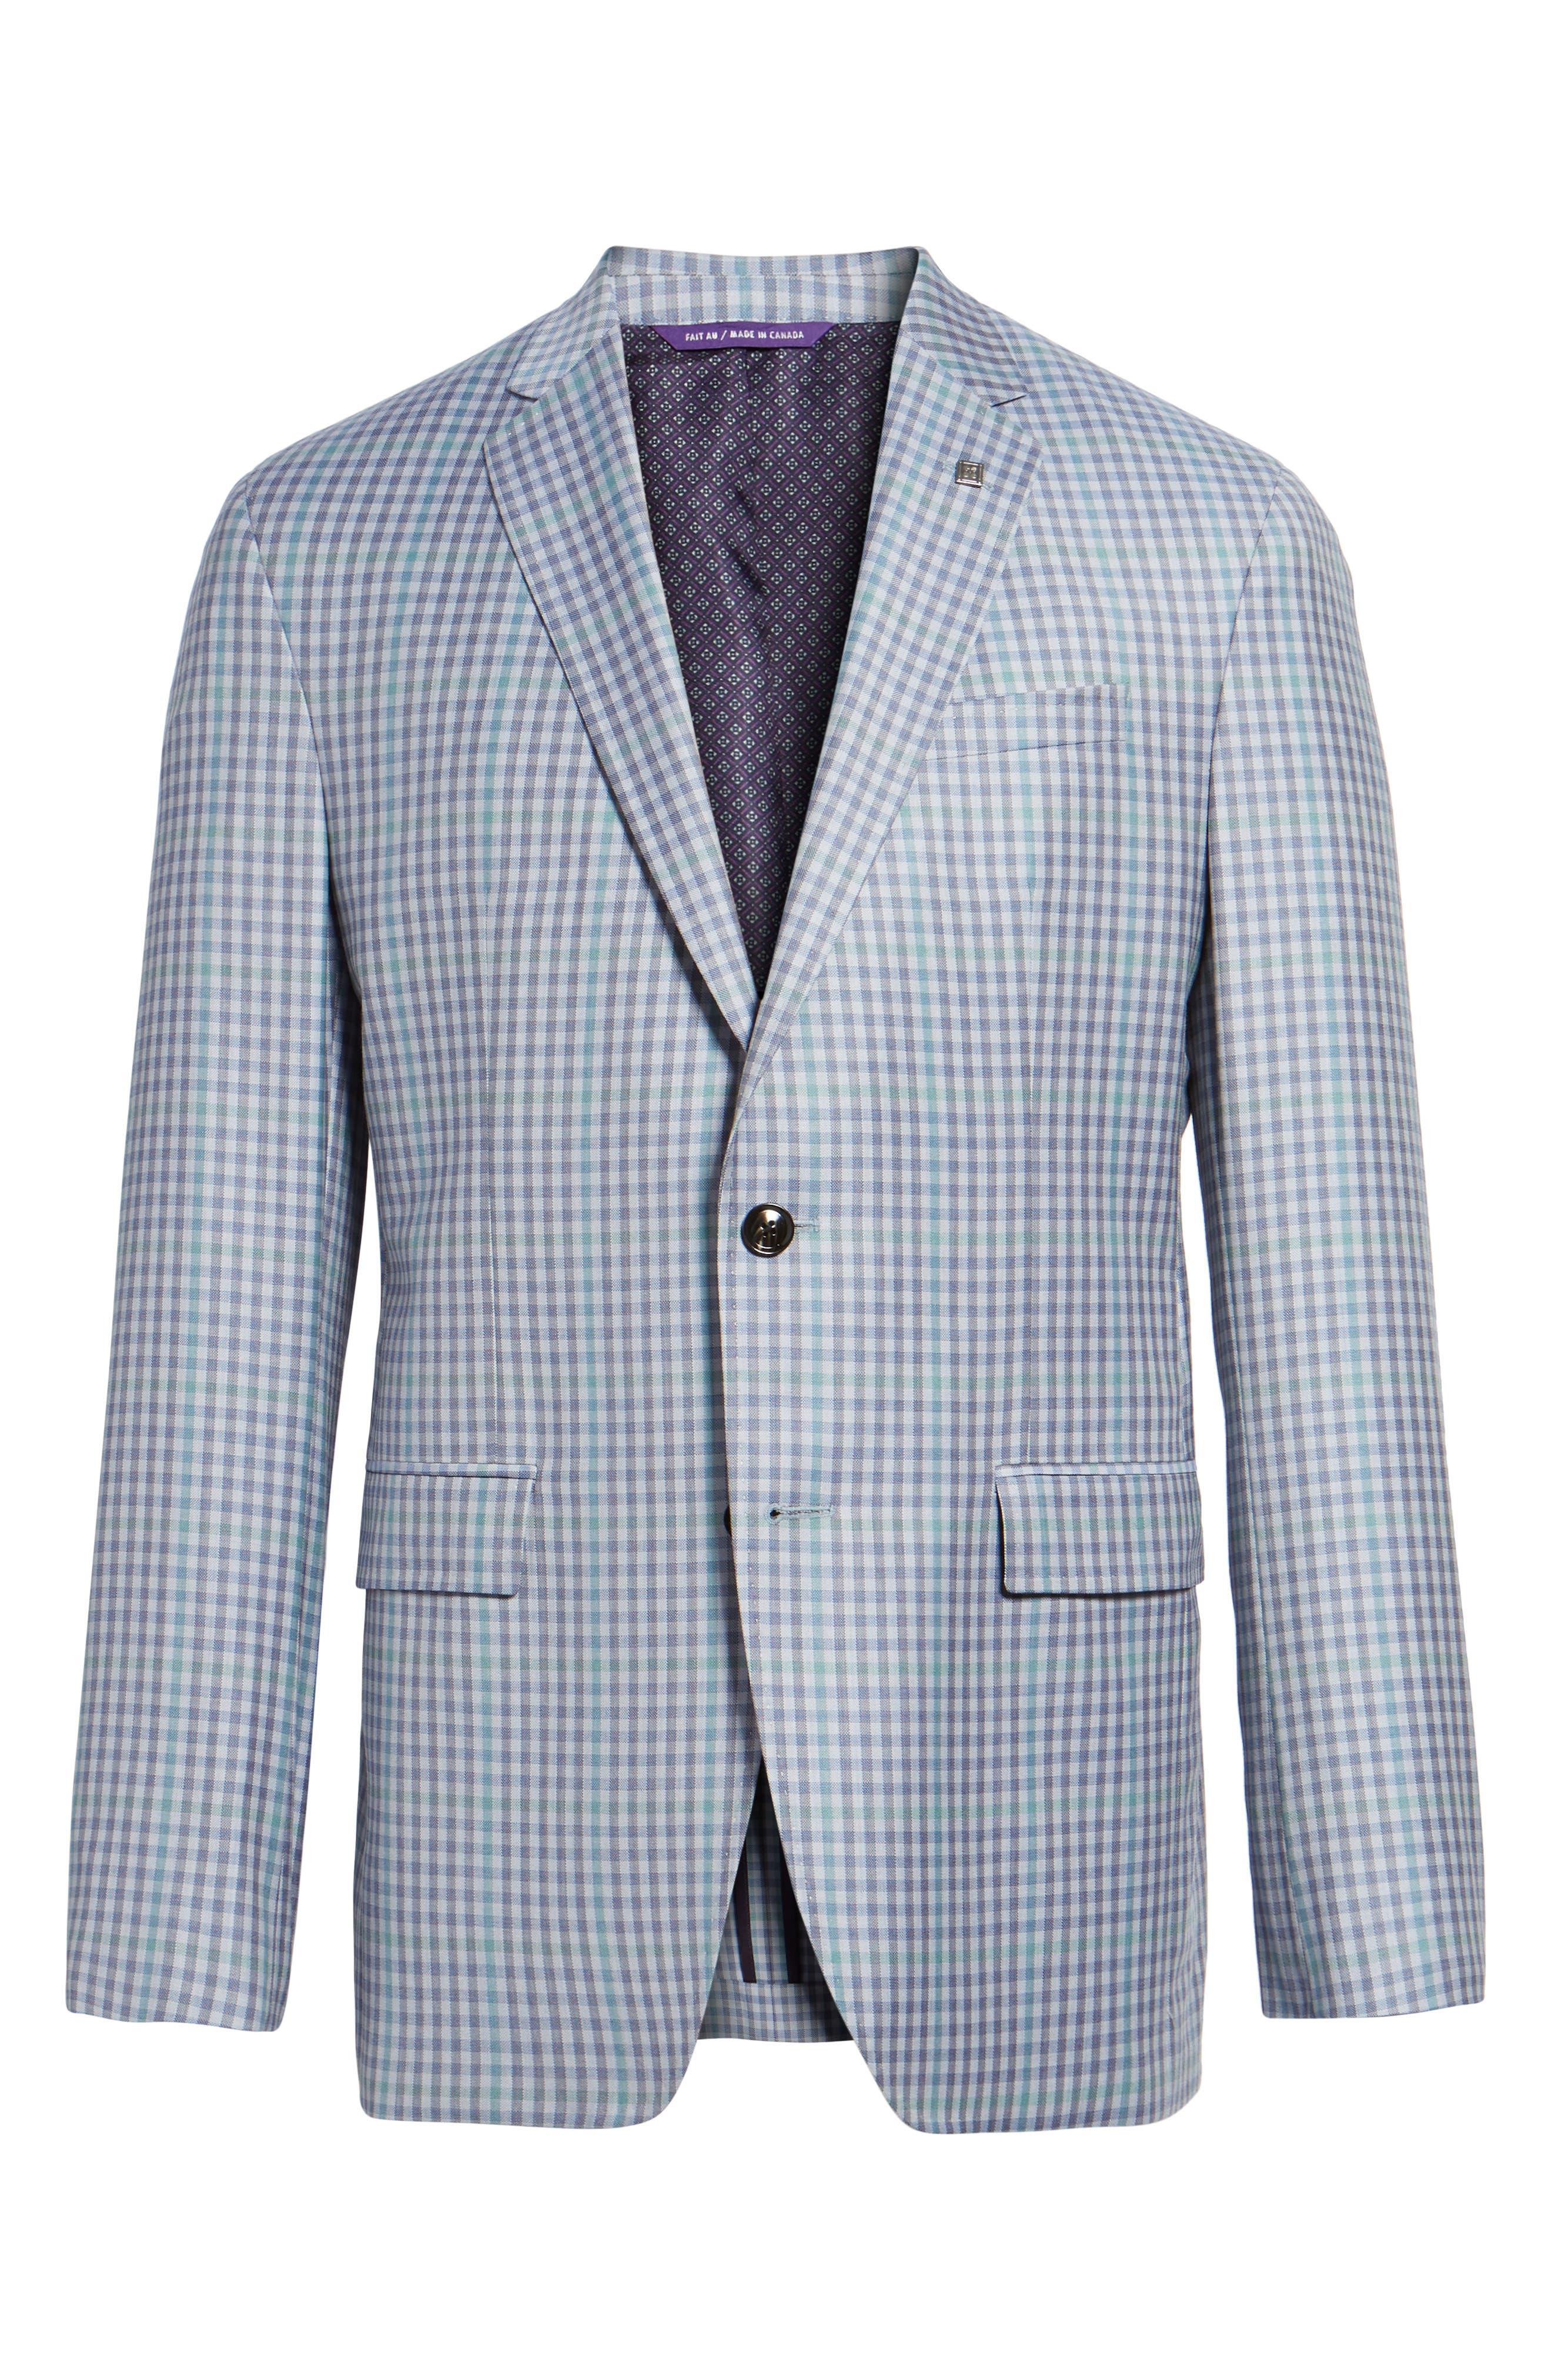 Konan Trim Fit Check Wool Sport Coat,                             Alternate thumbnail 6, color,                             Blue Grey Green Ck